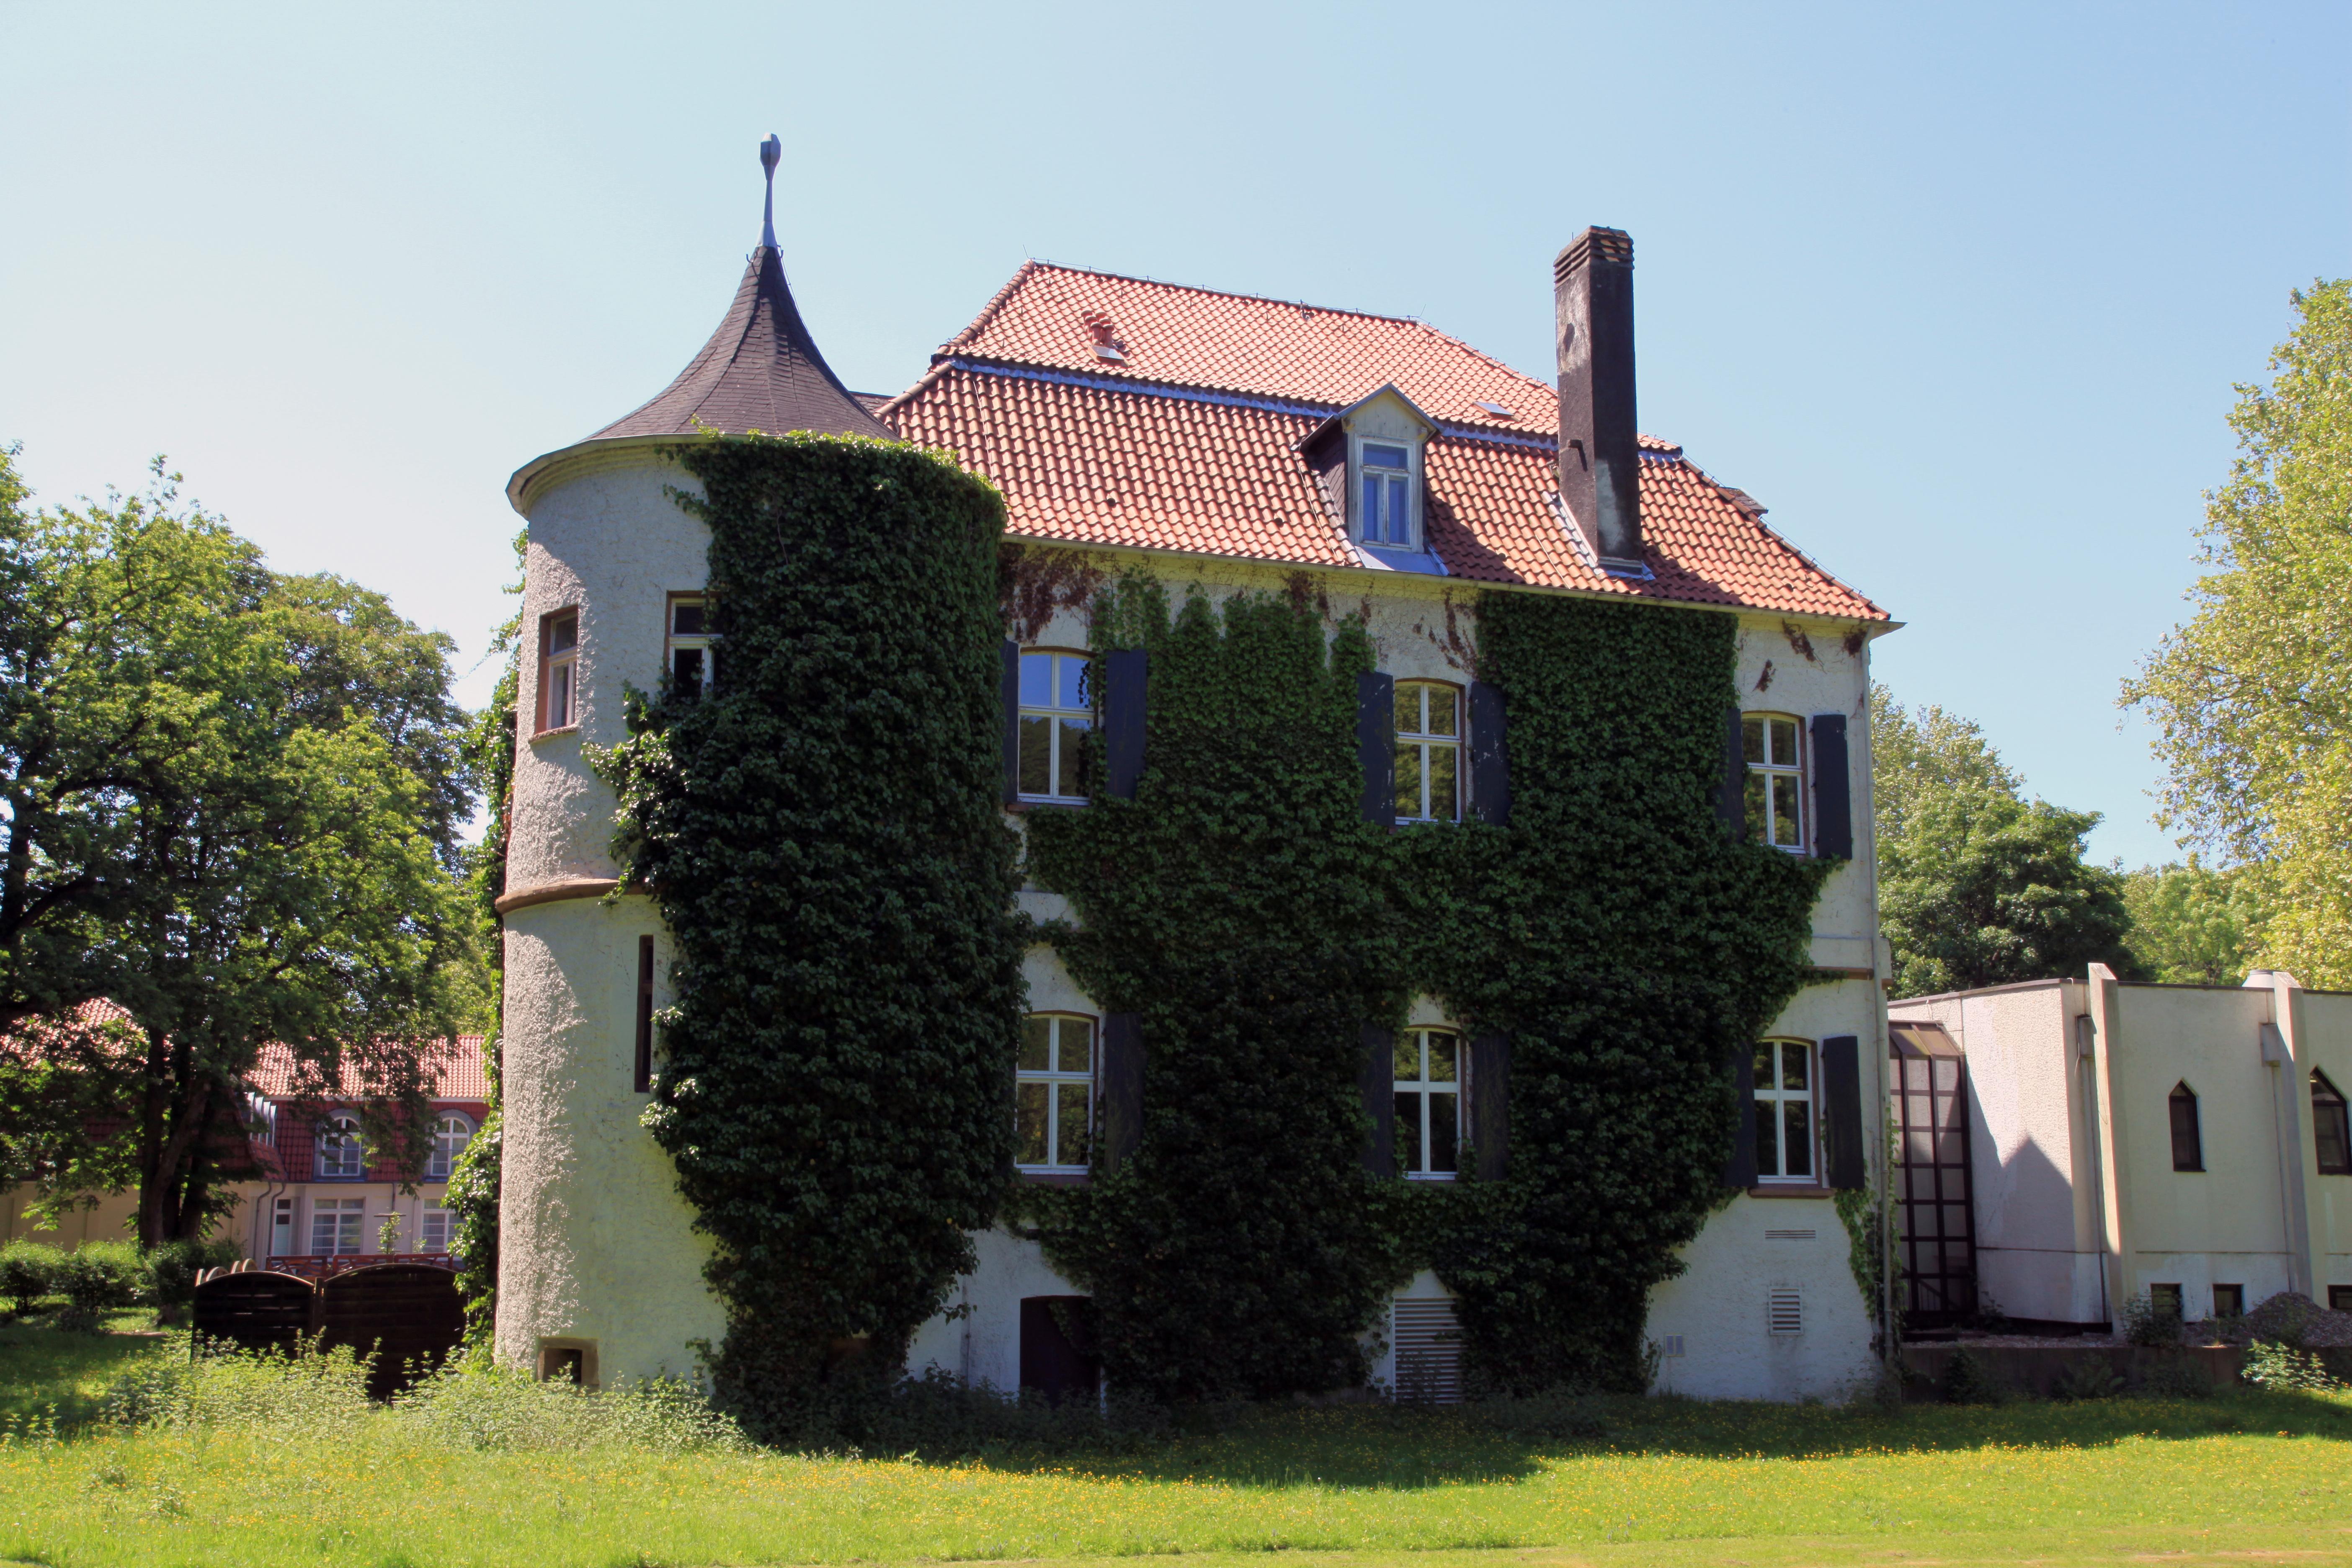 Haus Goldschmieding - Wikiwand